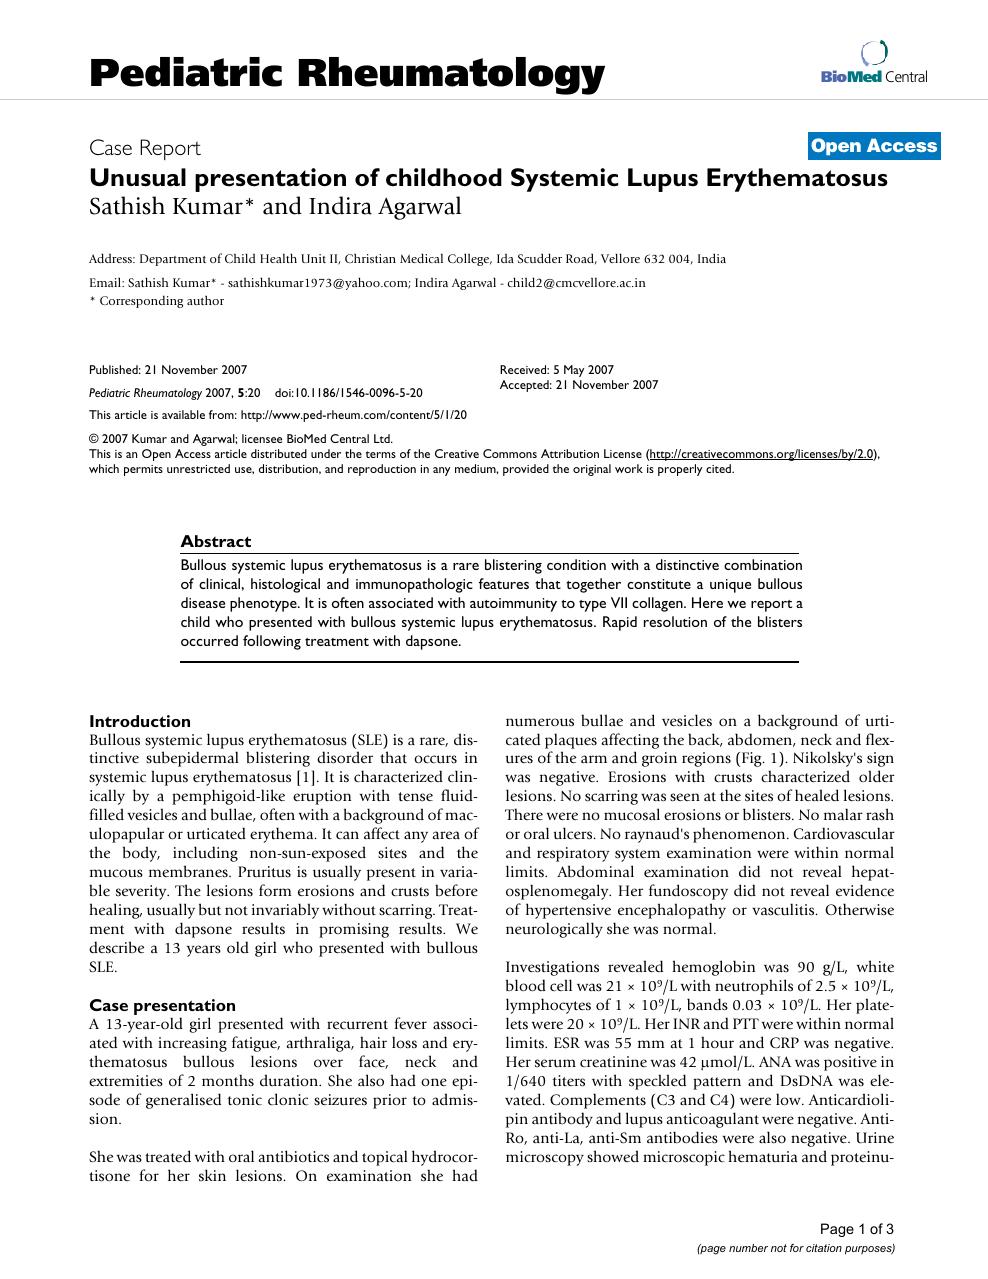 Unusual presentation of childhood Systemic Lupus